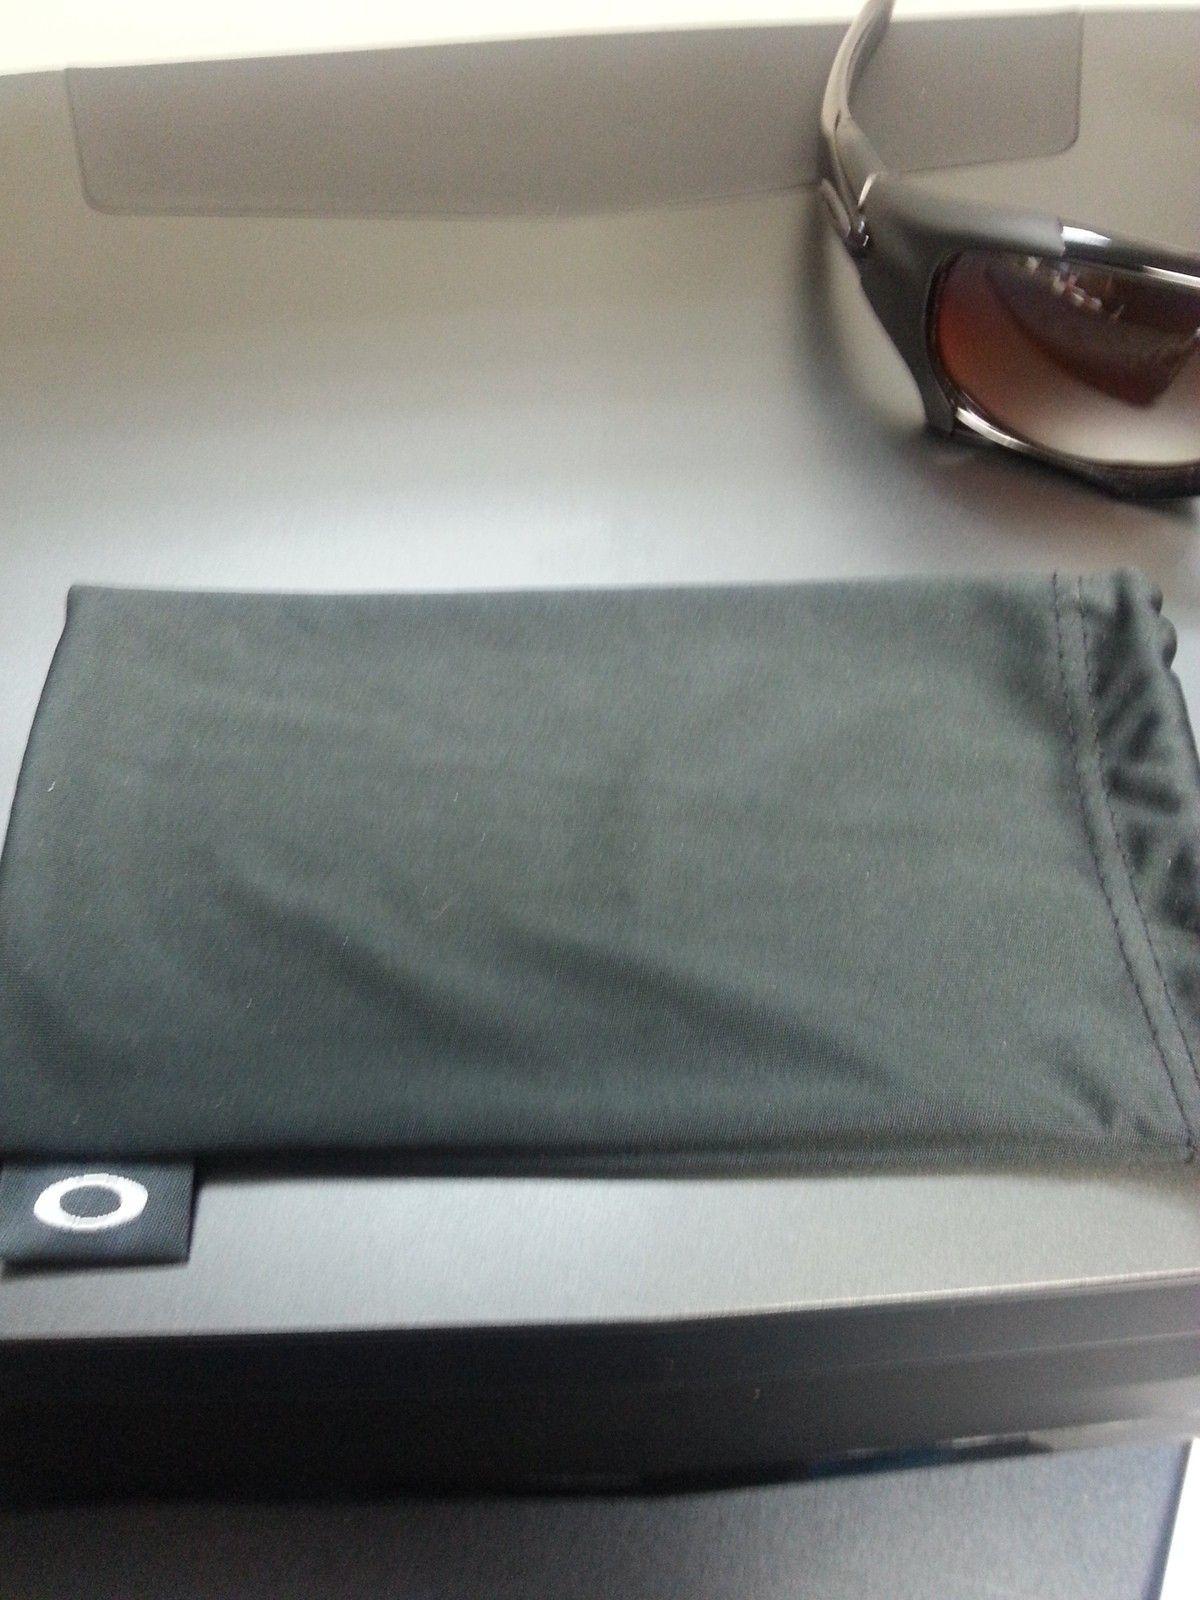 Pit Boss 2 (with LV bag) for Badman Dark Carbon/Pol. Black Lens - 20150430_131511.jpg